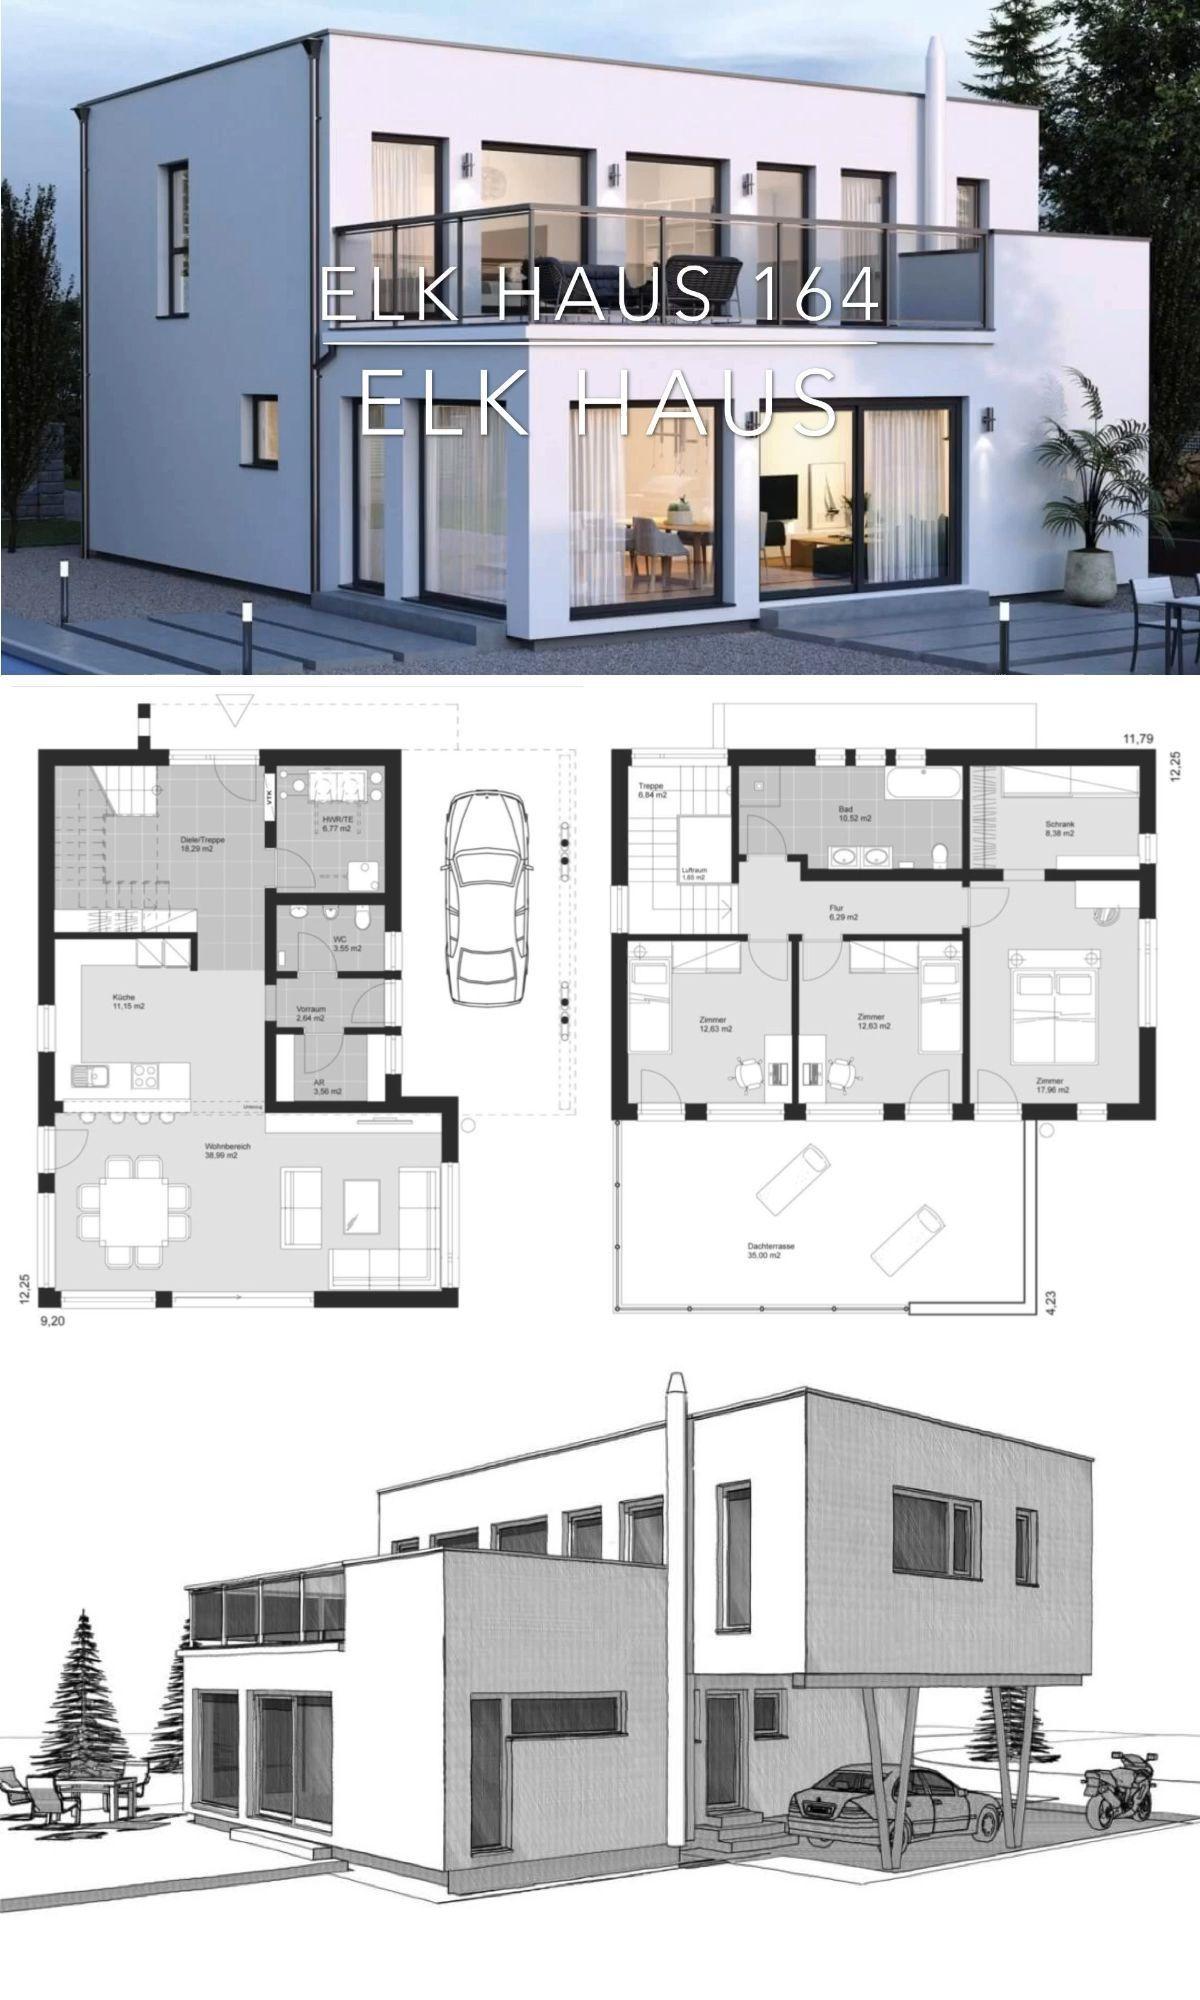 Hausbaudirektde Hausbaudirekt Homesweethome Architecture Contemporary Arquitectu Bauhaus Architecture Modern Architecture House Double Storey House Plans